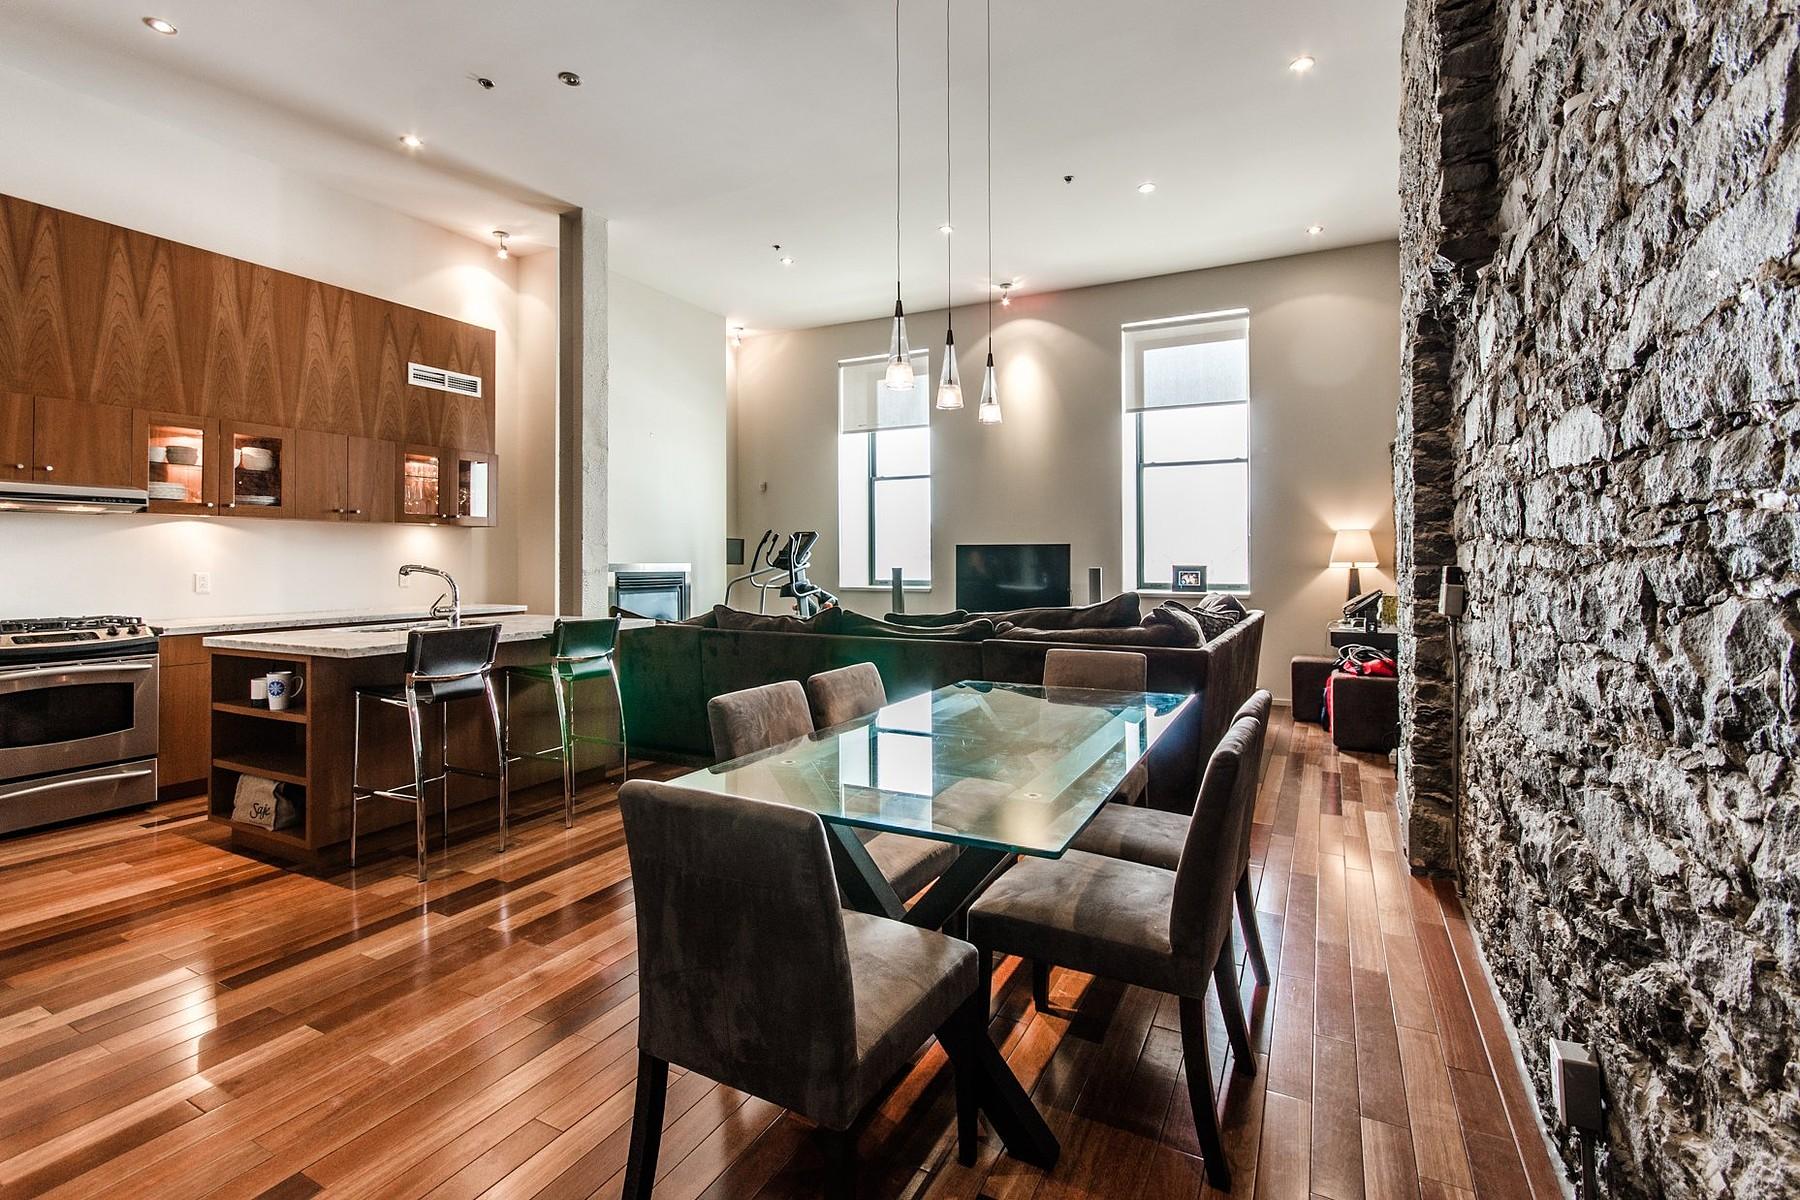 Частный односемейный дом для того Продажа на Ville-Marie (Montréal), Montréal 64 Rue St-Paul O., Apt. 107 Montreal, Квебек H2Y4B8 Канада